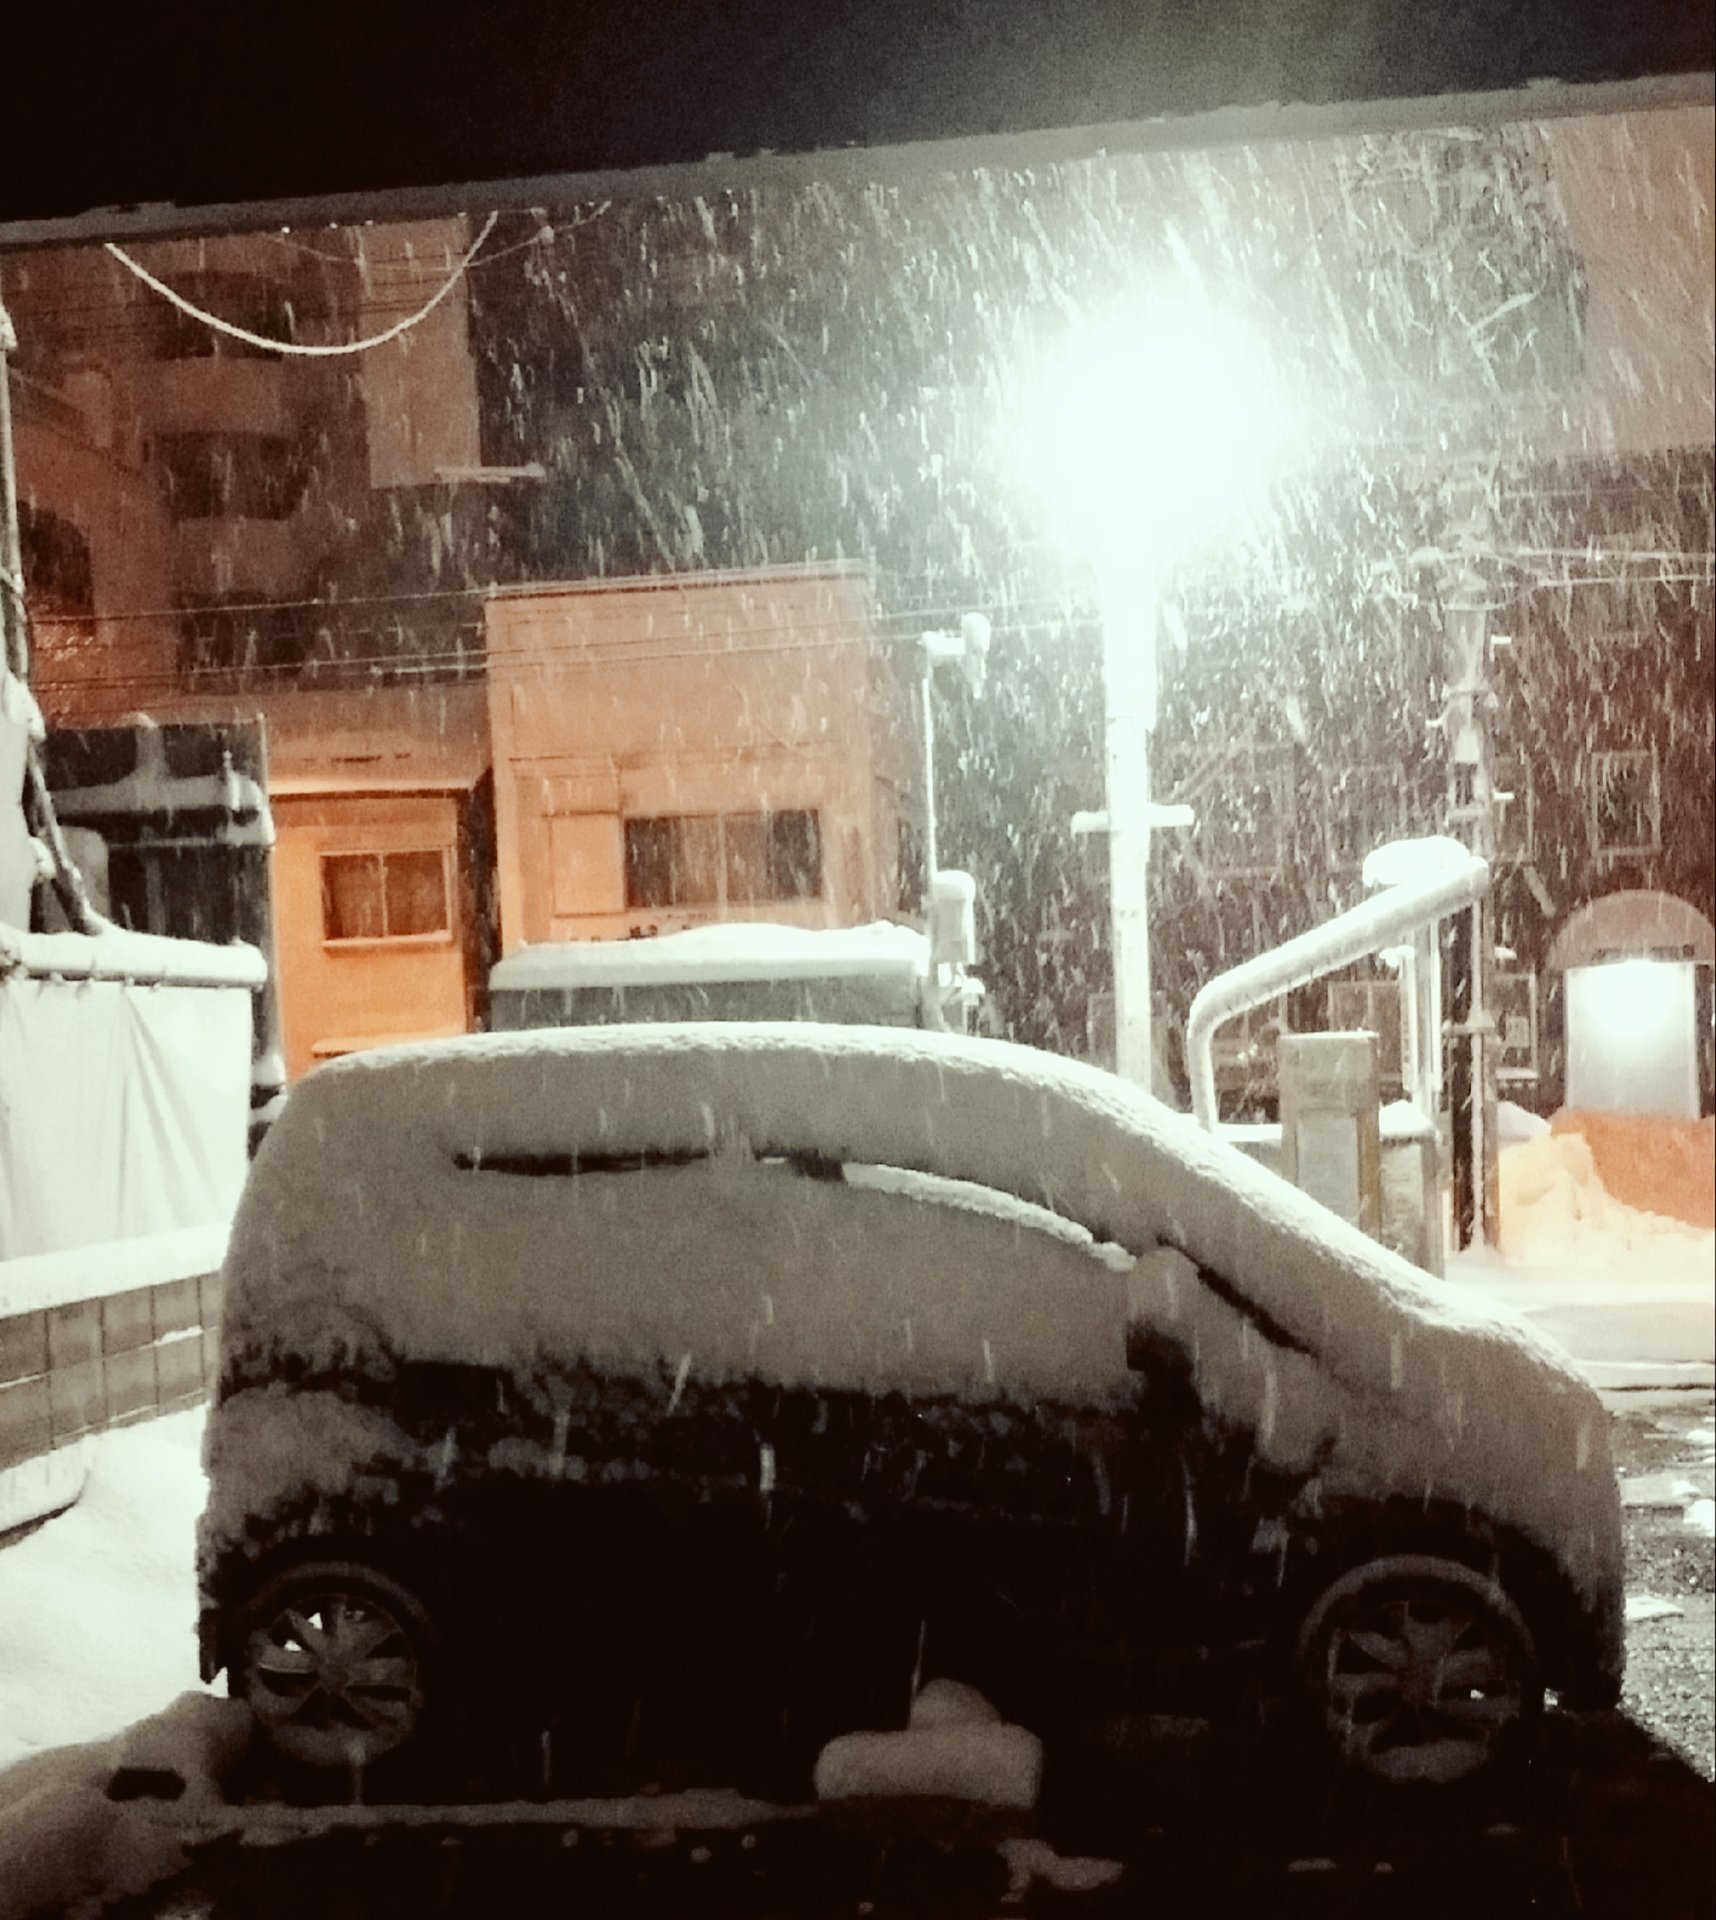 snowy_sapporo_morning1